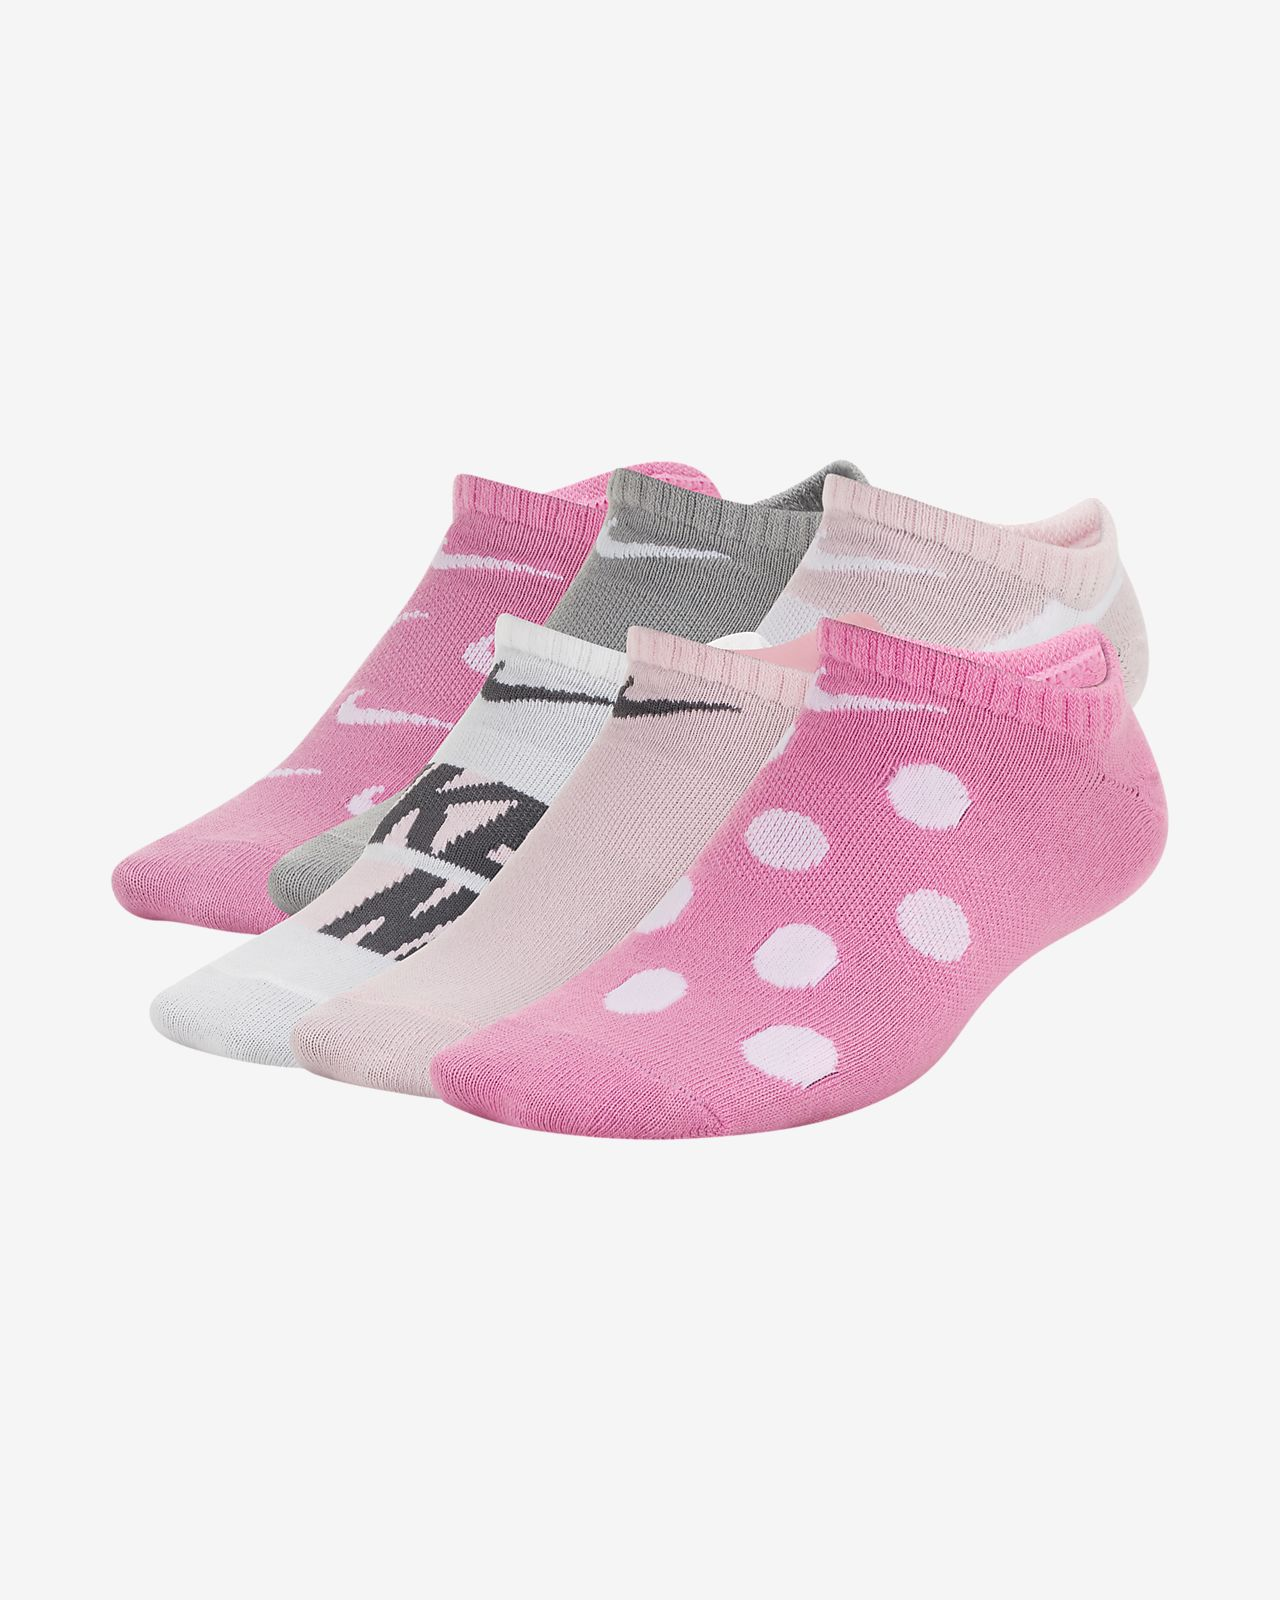 Nike Everyday Older Kids' Lightweight Graphic No-Show Socks (6 Pairs)